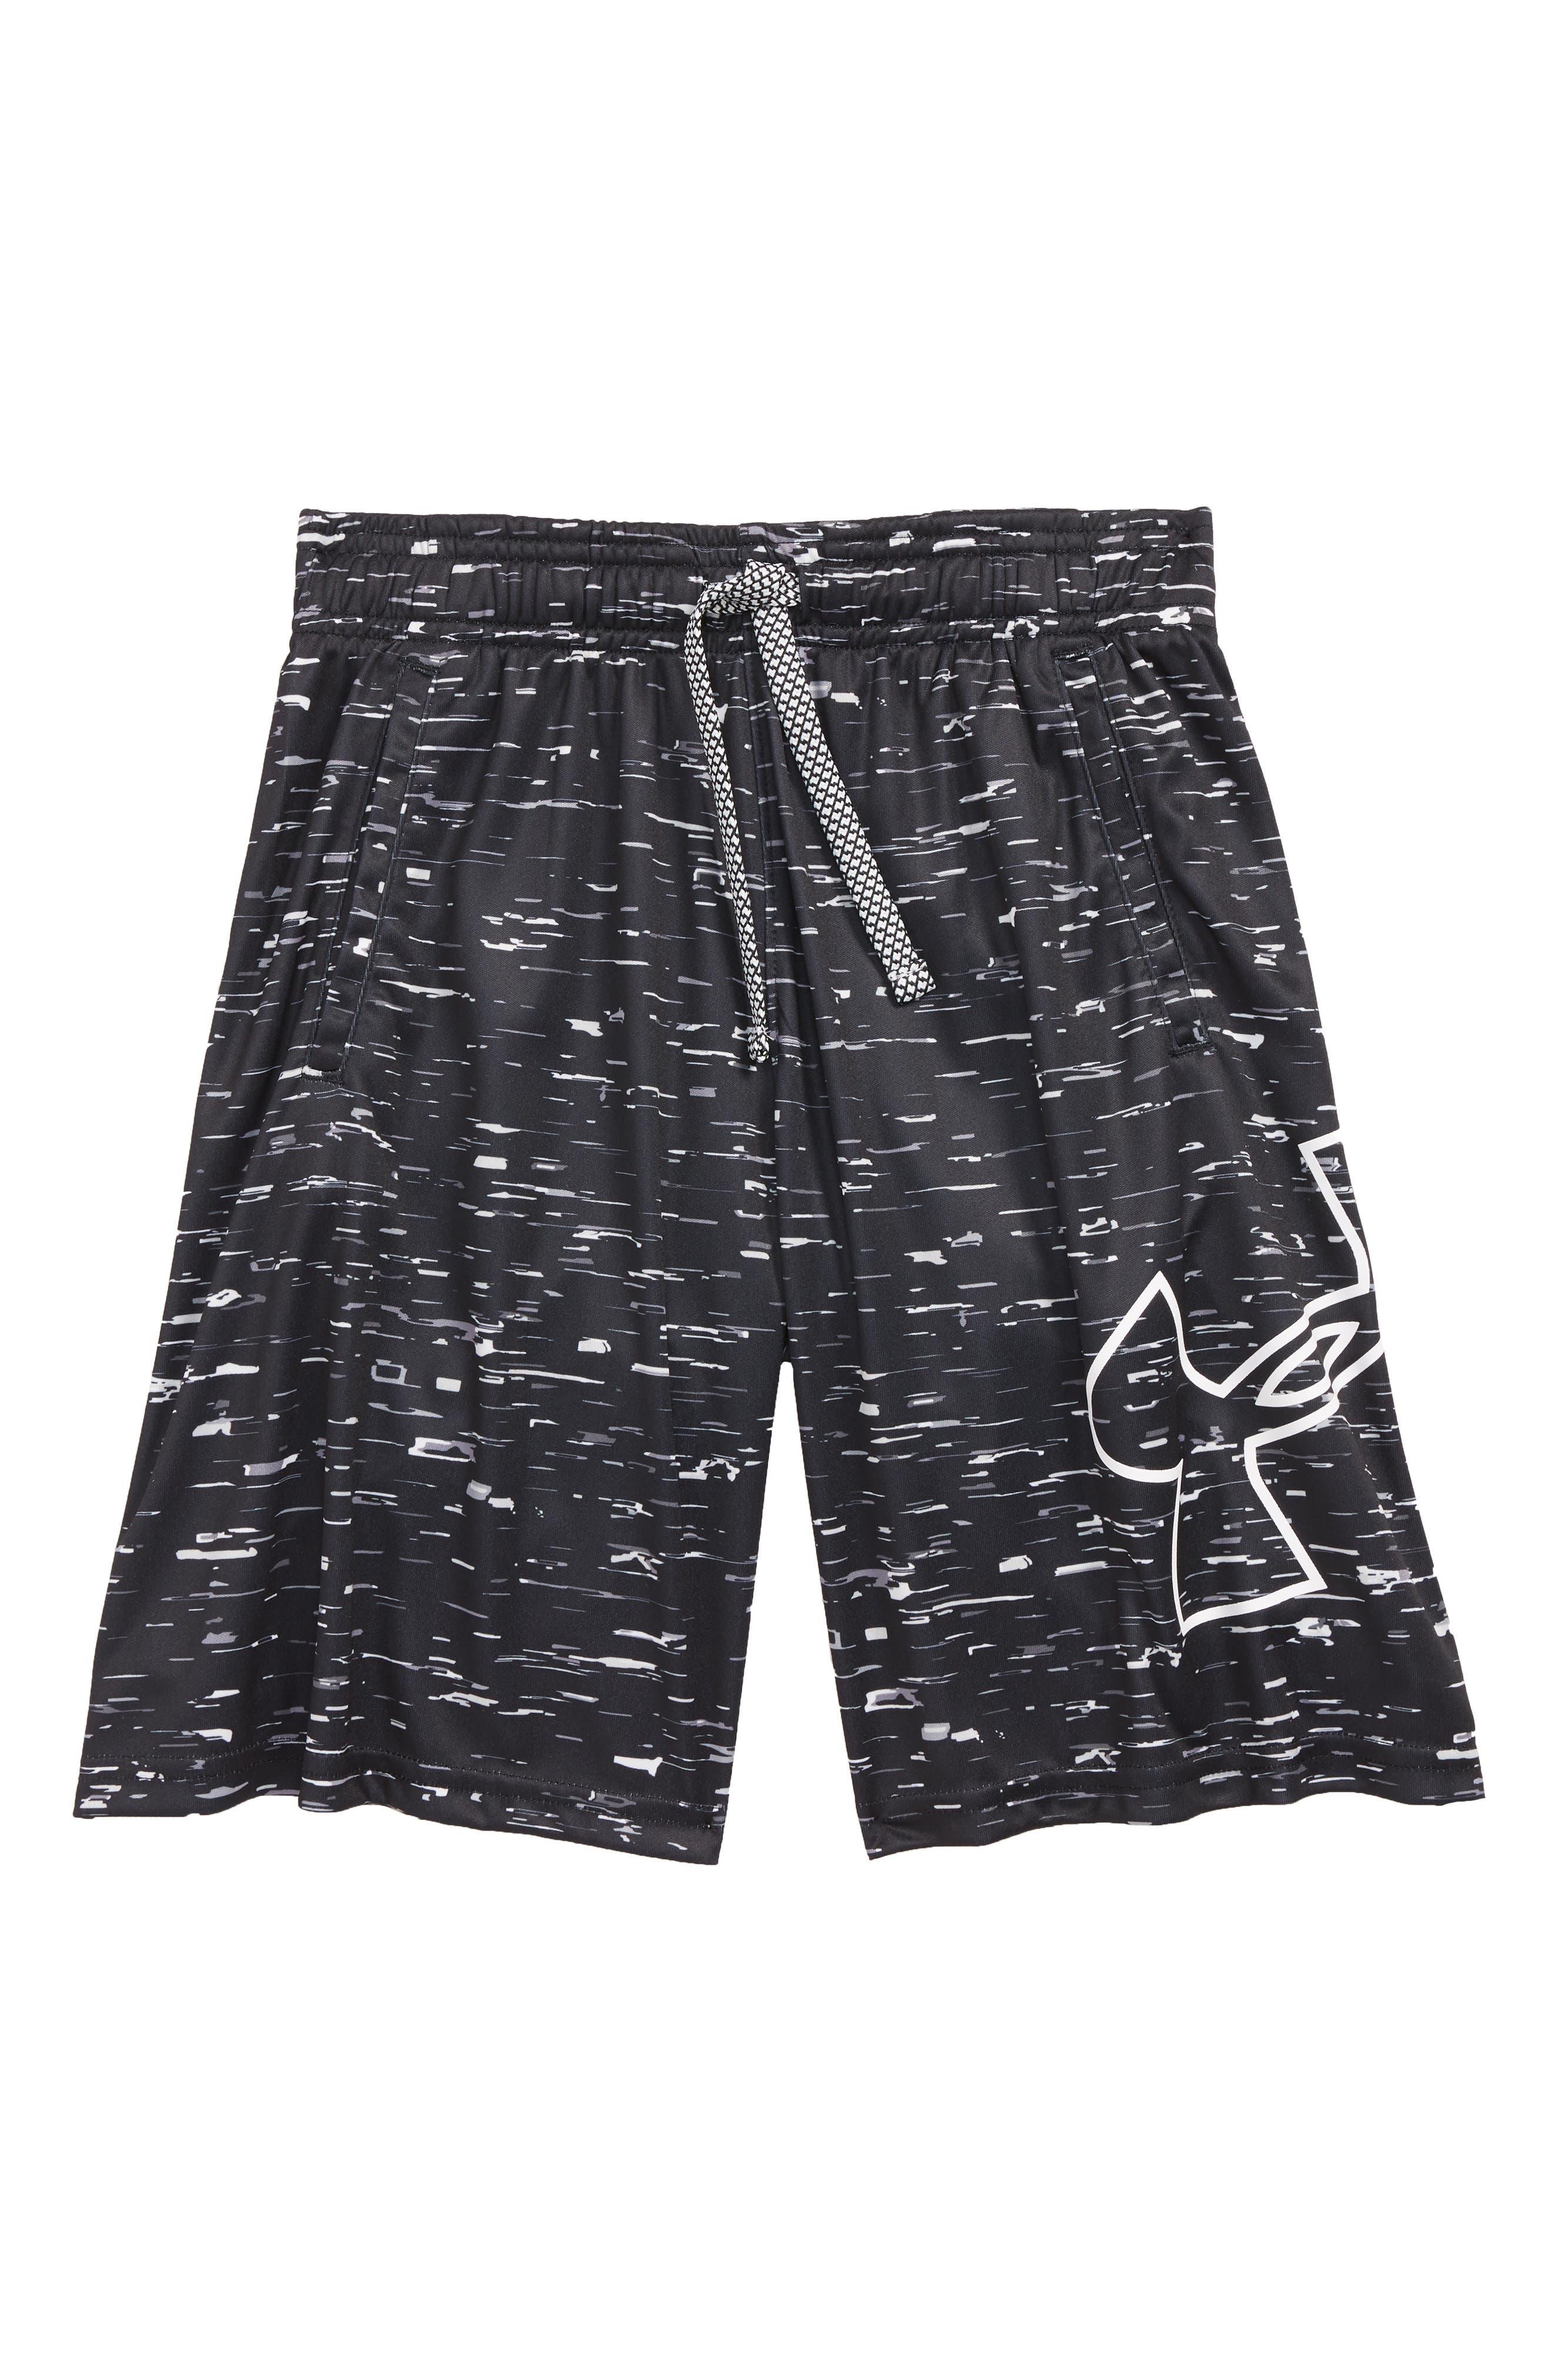 Renegade 2.0 Shorts, Main, color, BLACK/ WHITE